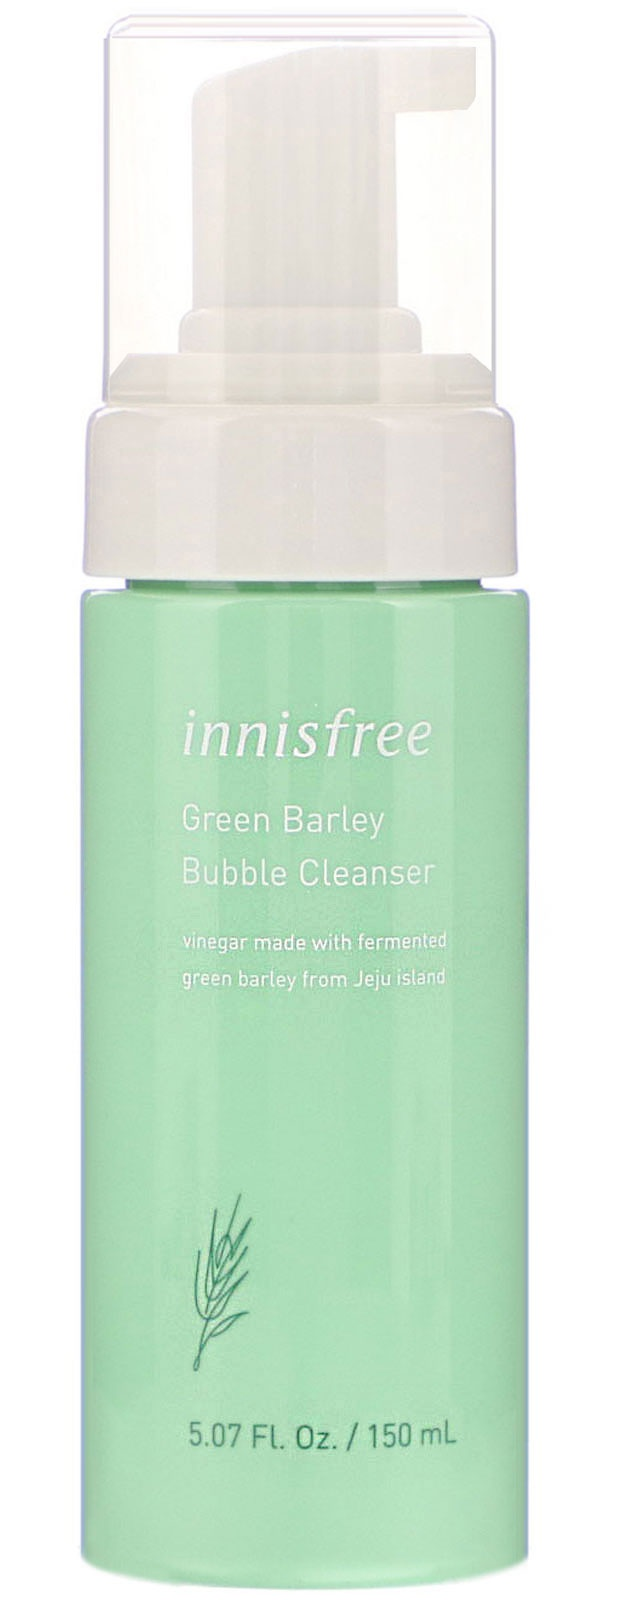 innisfree Green Barley Bubble Cleanser